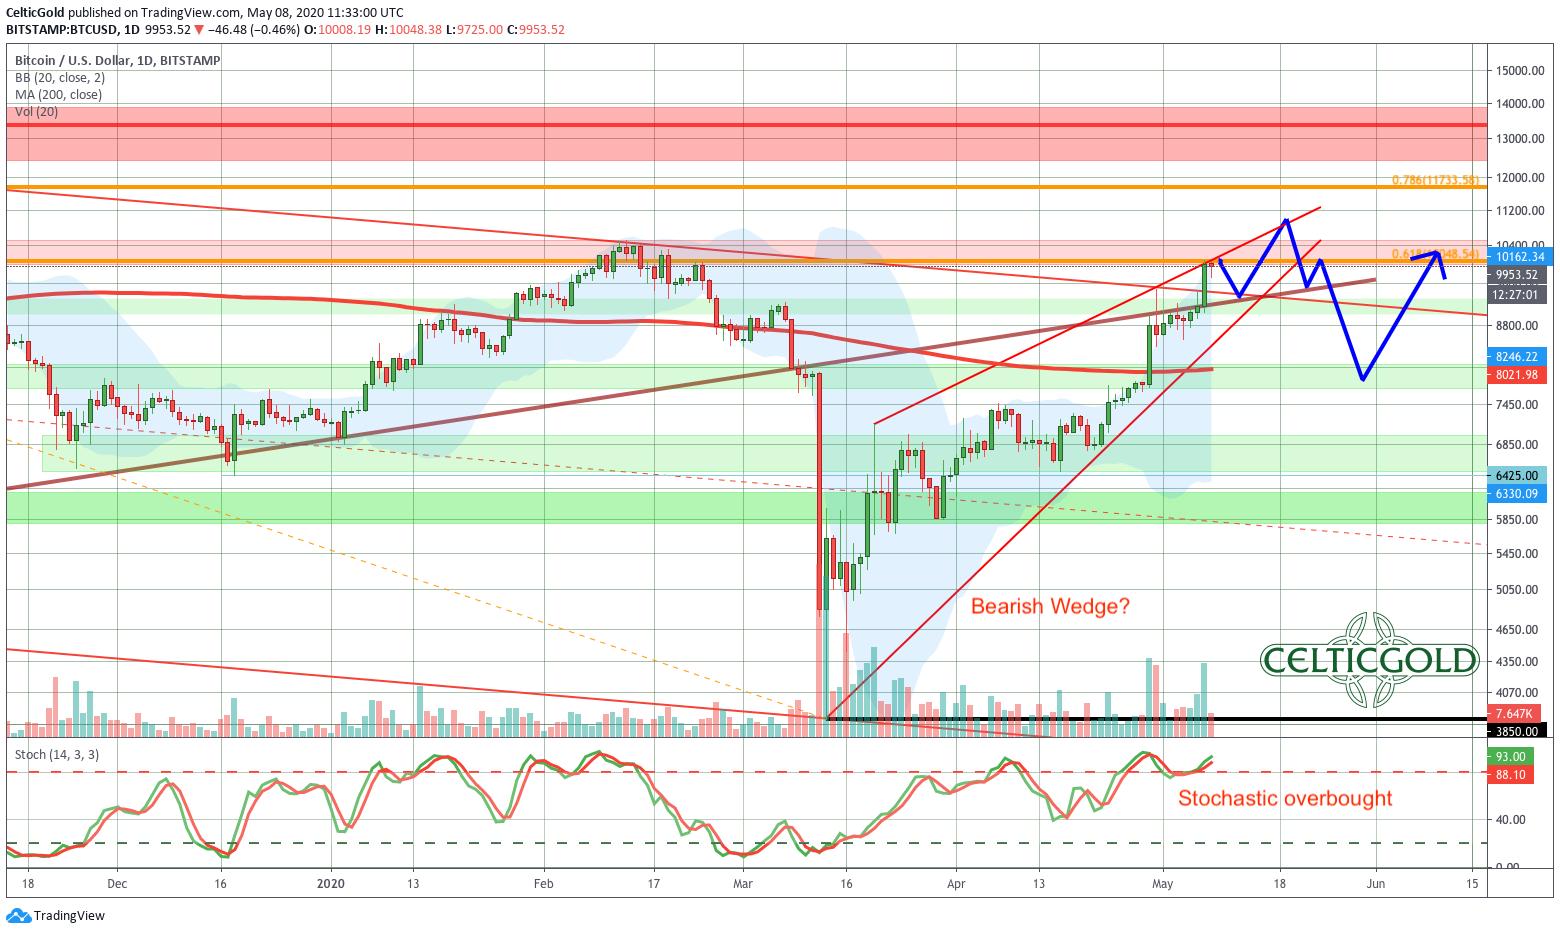 Bitcoin Daily Chart, Source: Tradingview